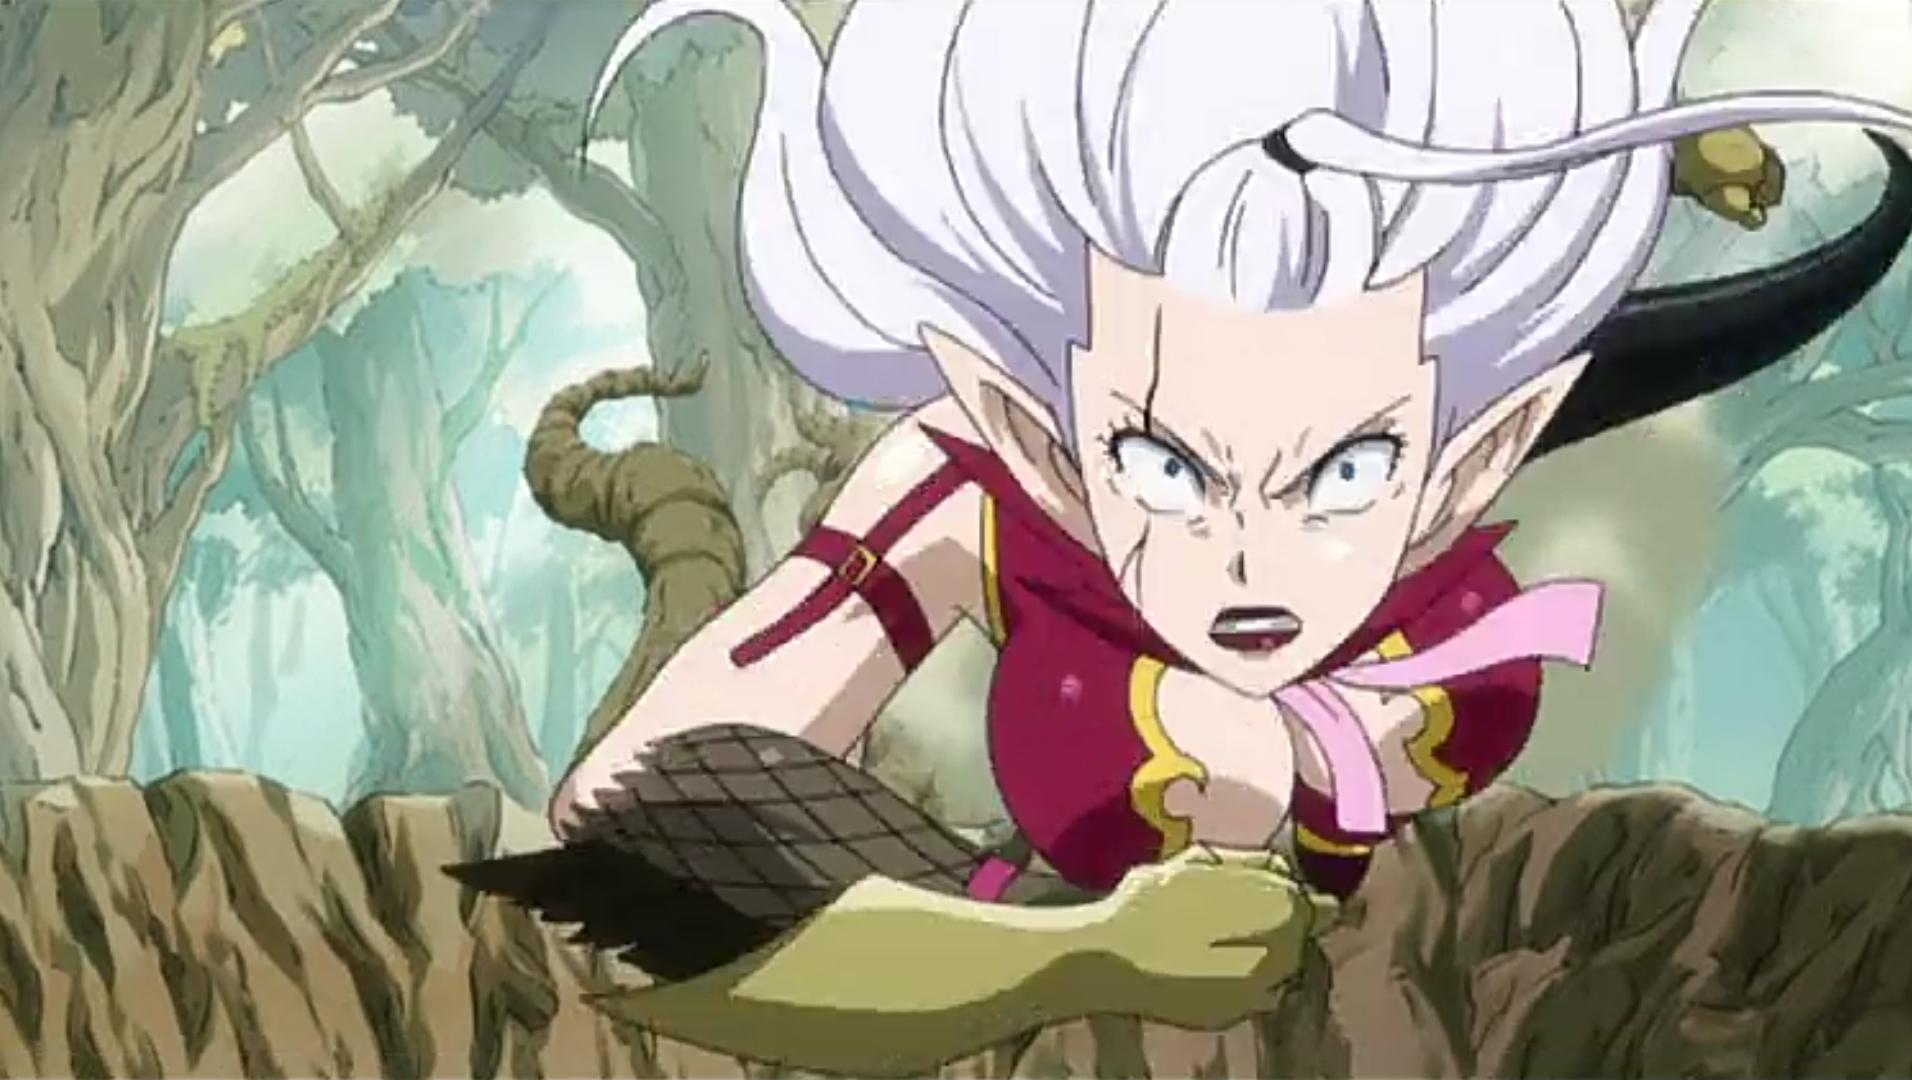 Fairy Tail Mirajane en 2020 Dessin animé, Dessin, Animé